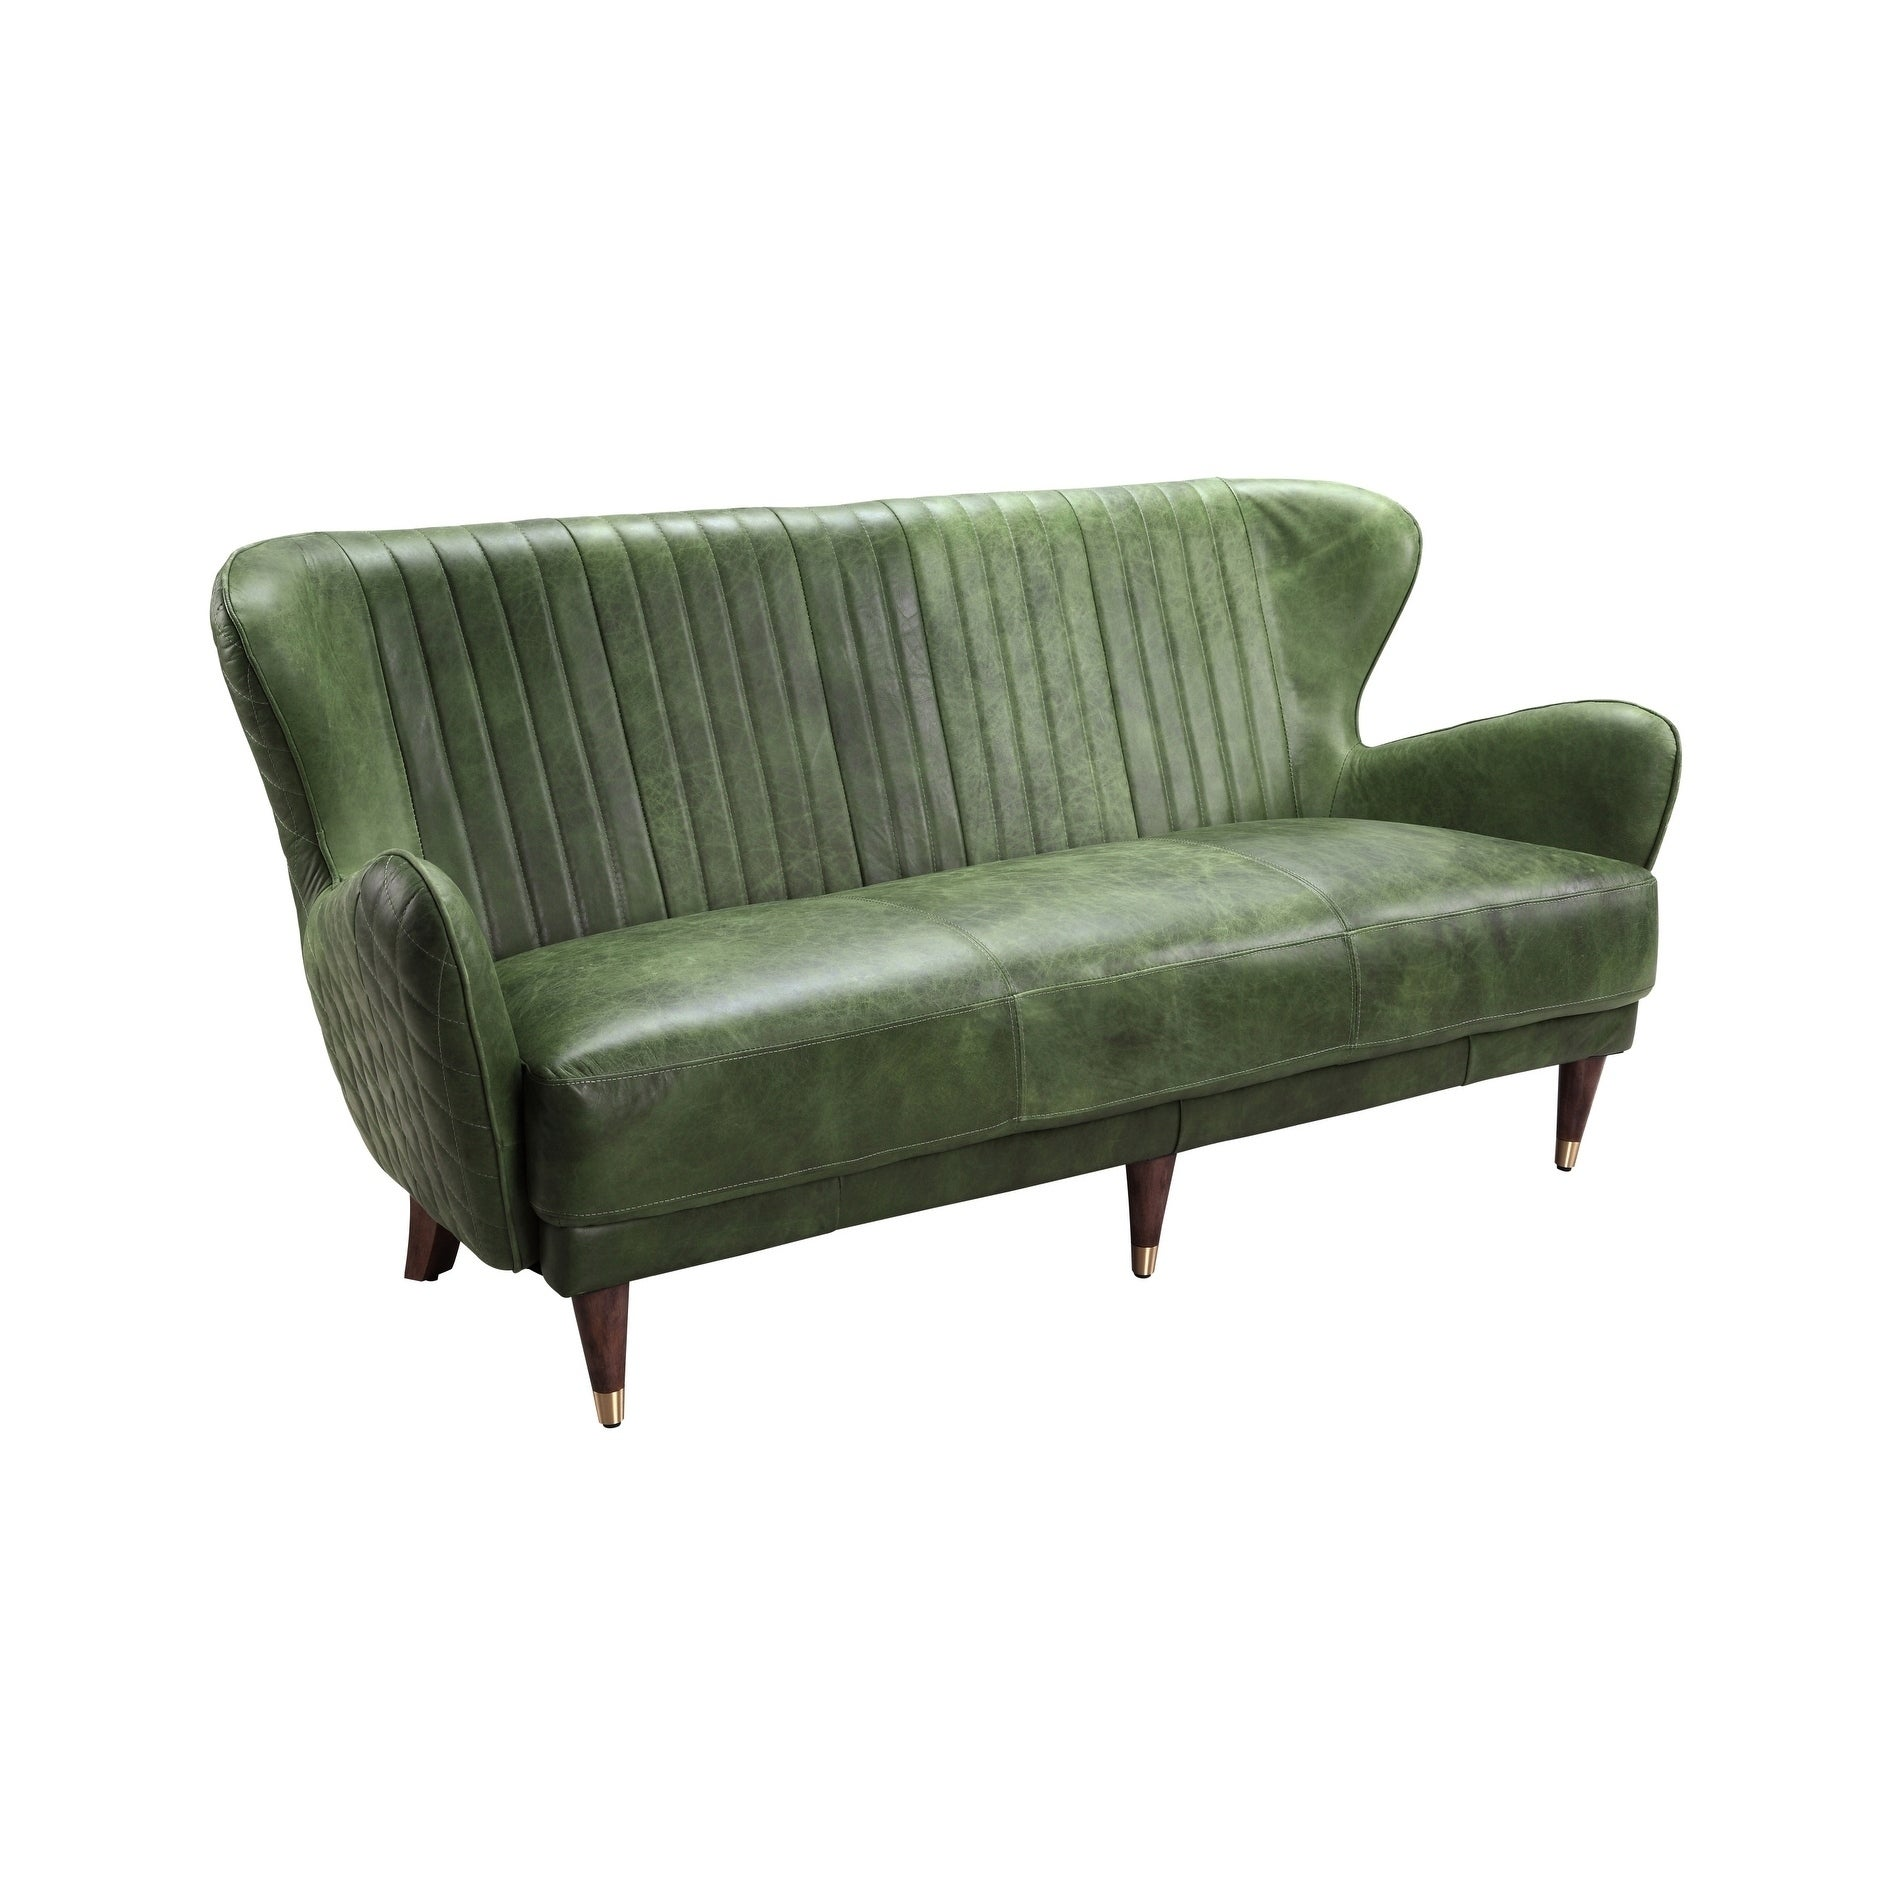 Aurelle Home Keaton Chartreuse Emerald Tight Back Leather...